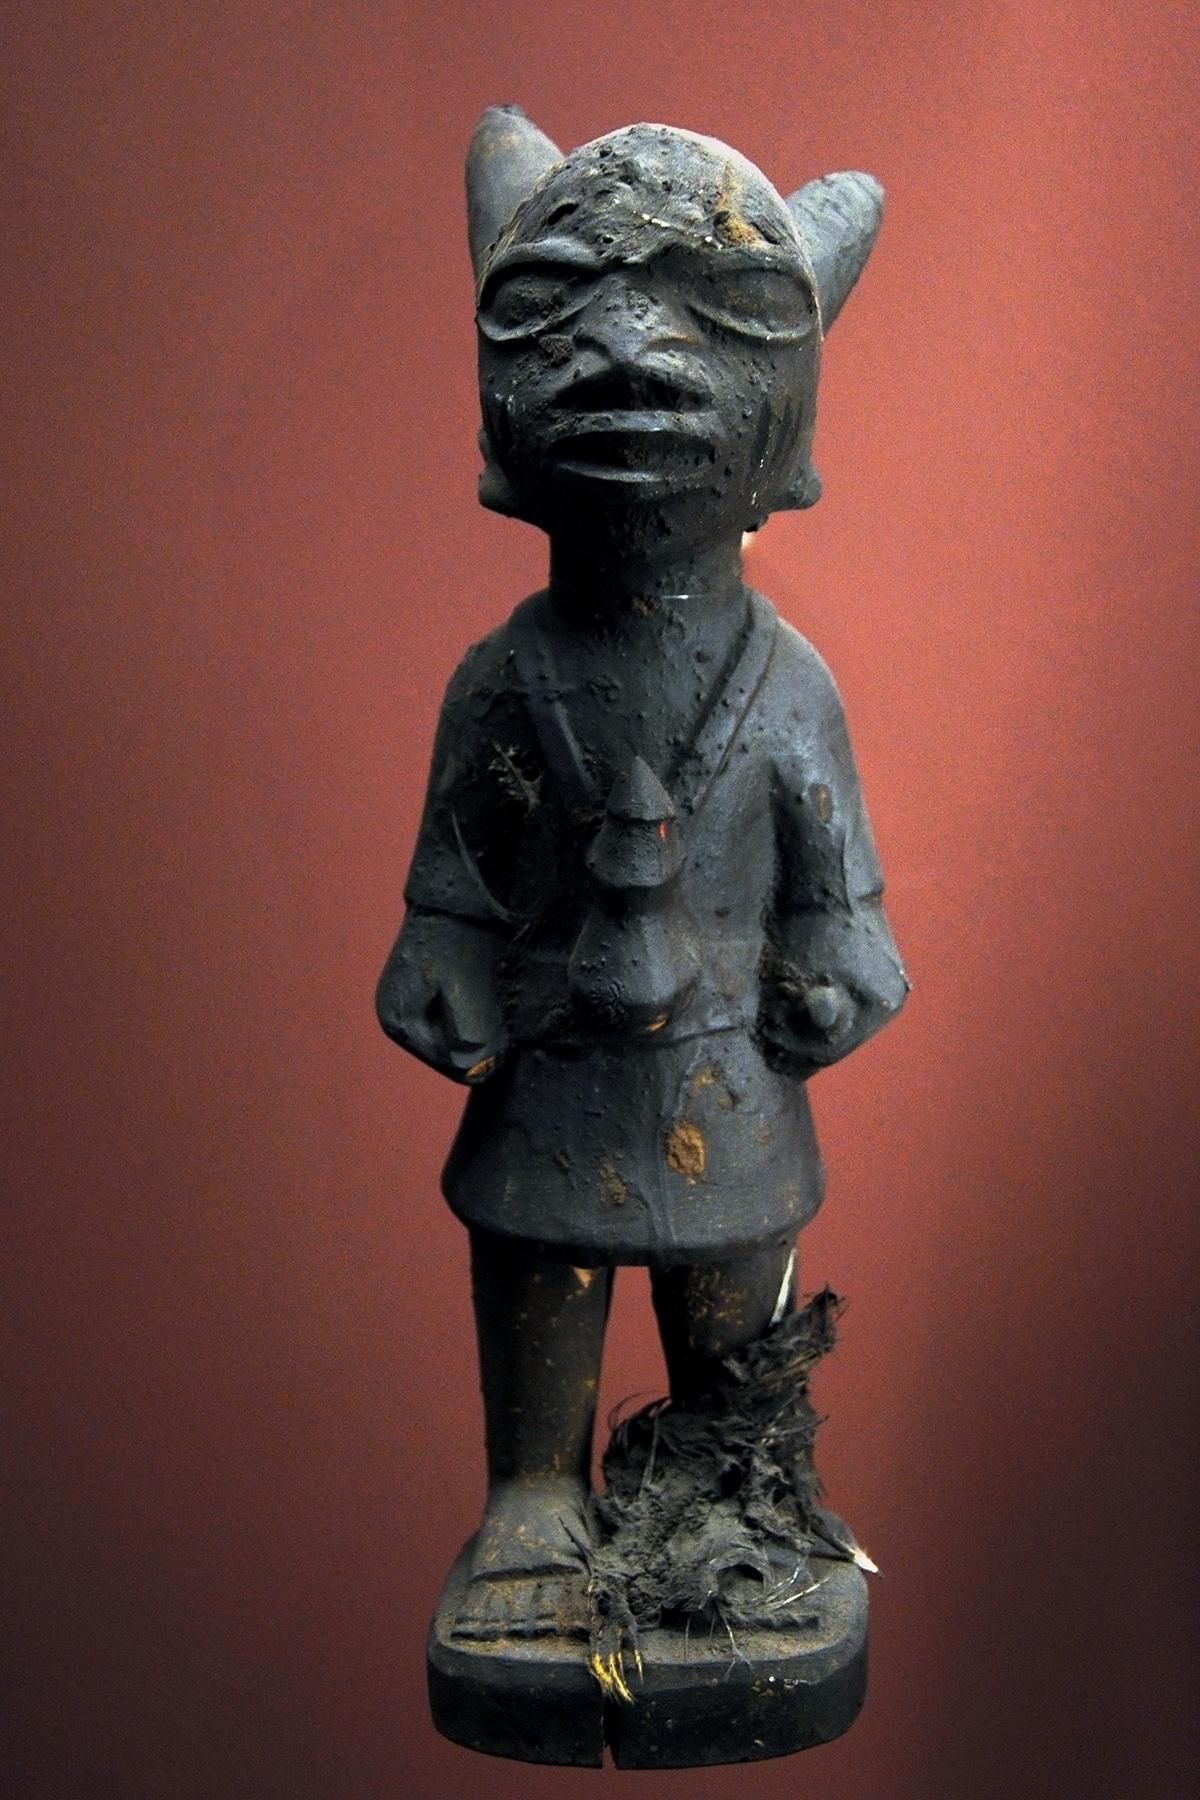 Estatuilla de orisha yoruba. Museo africano de Lyon. Original de Abeokuta, Nigeria